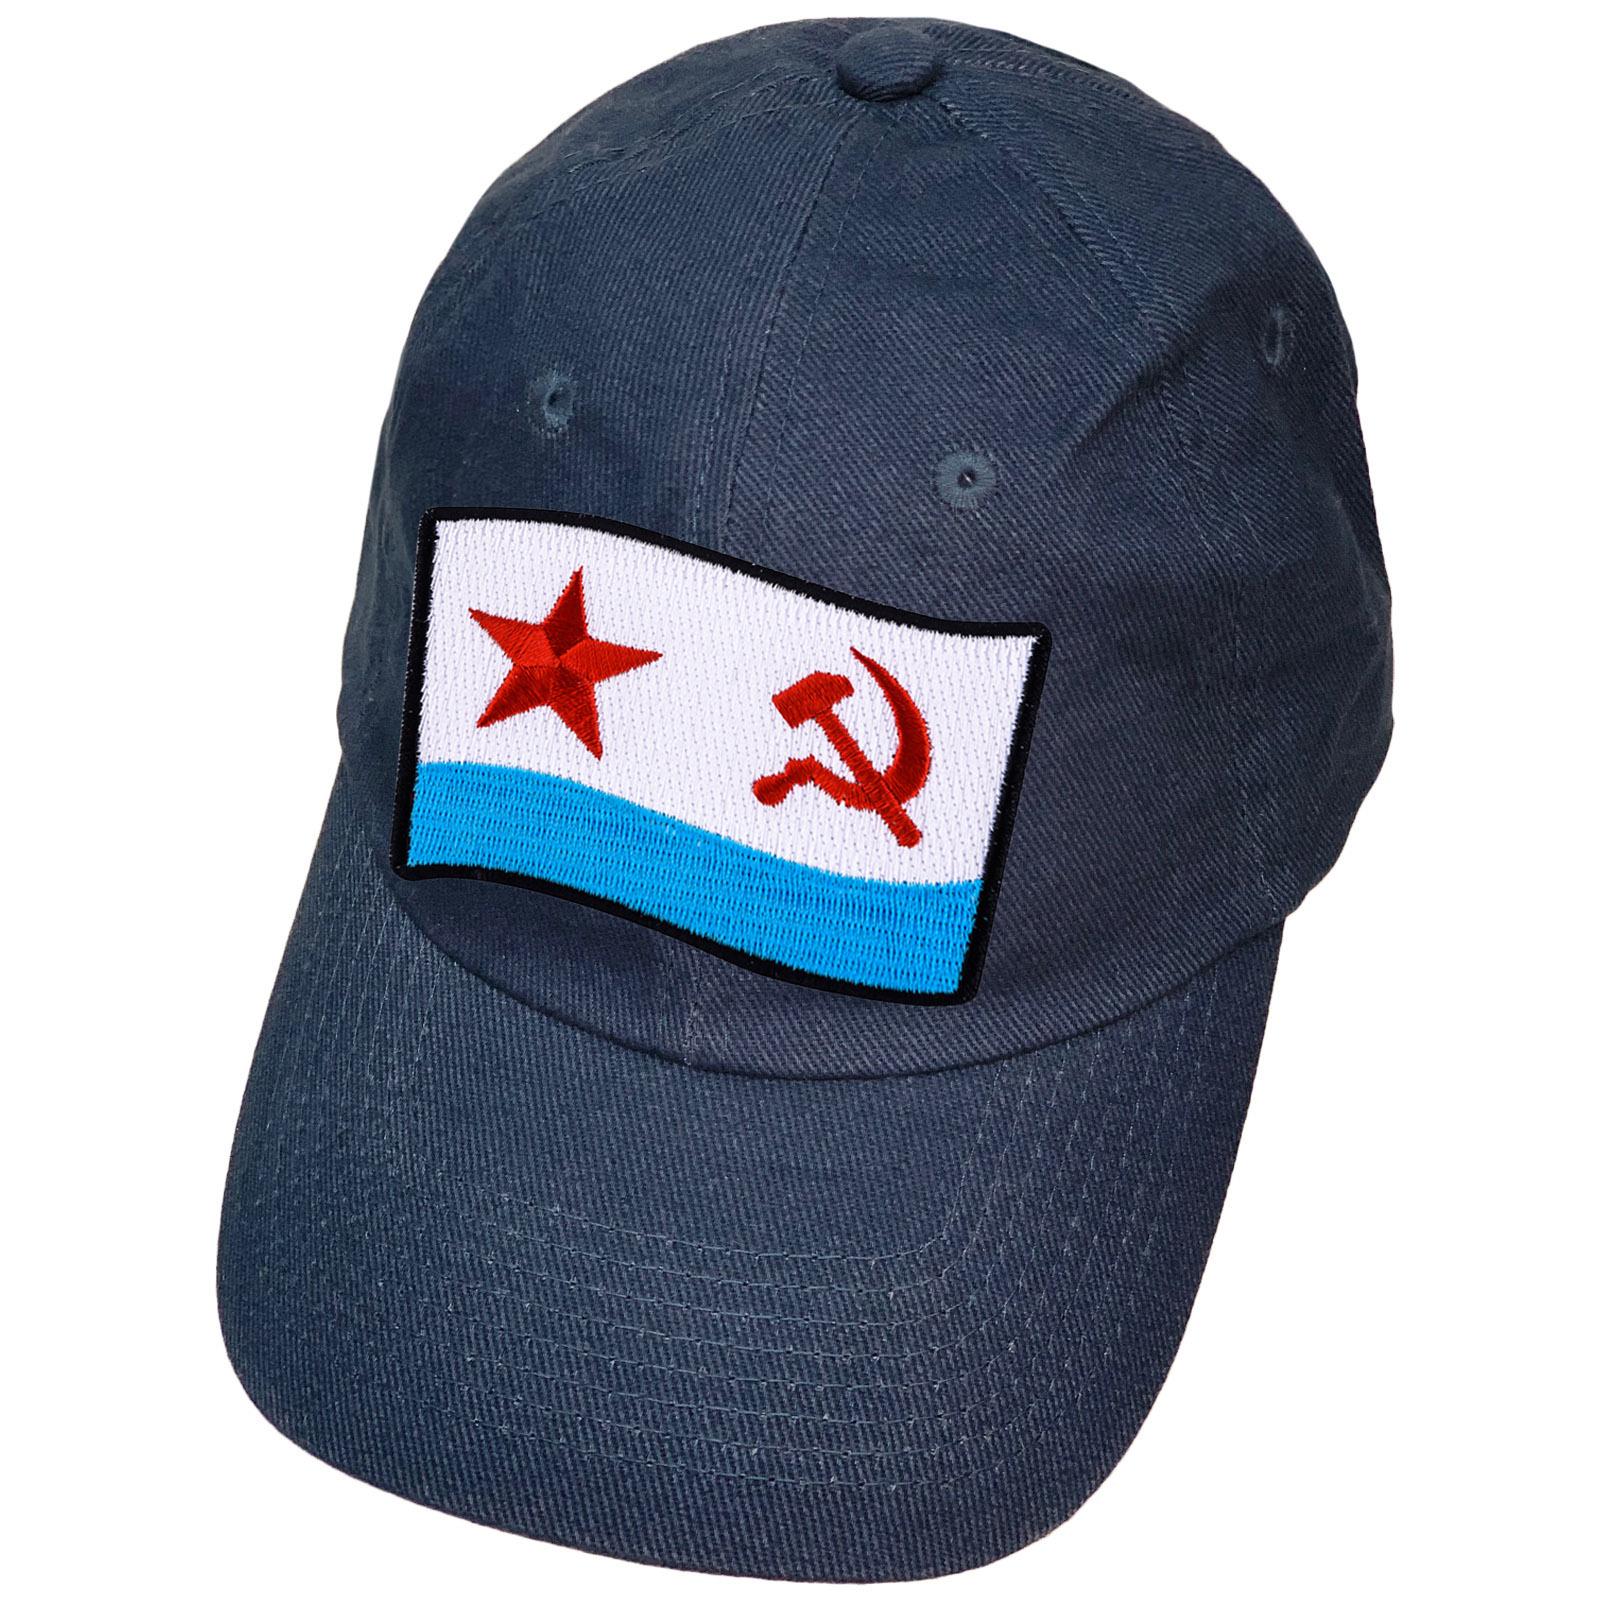 Синяя кепка с нашивкой флагом ВМФ СССР